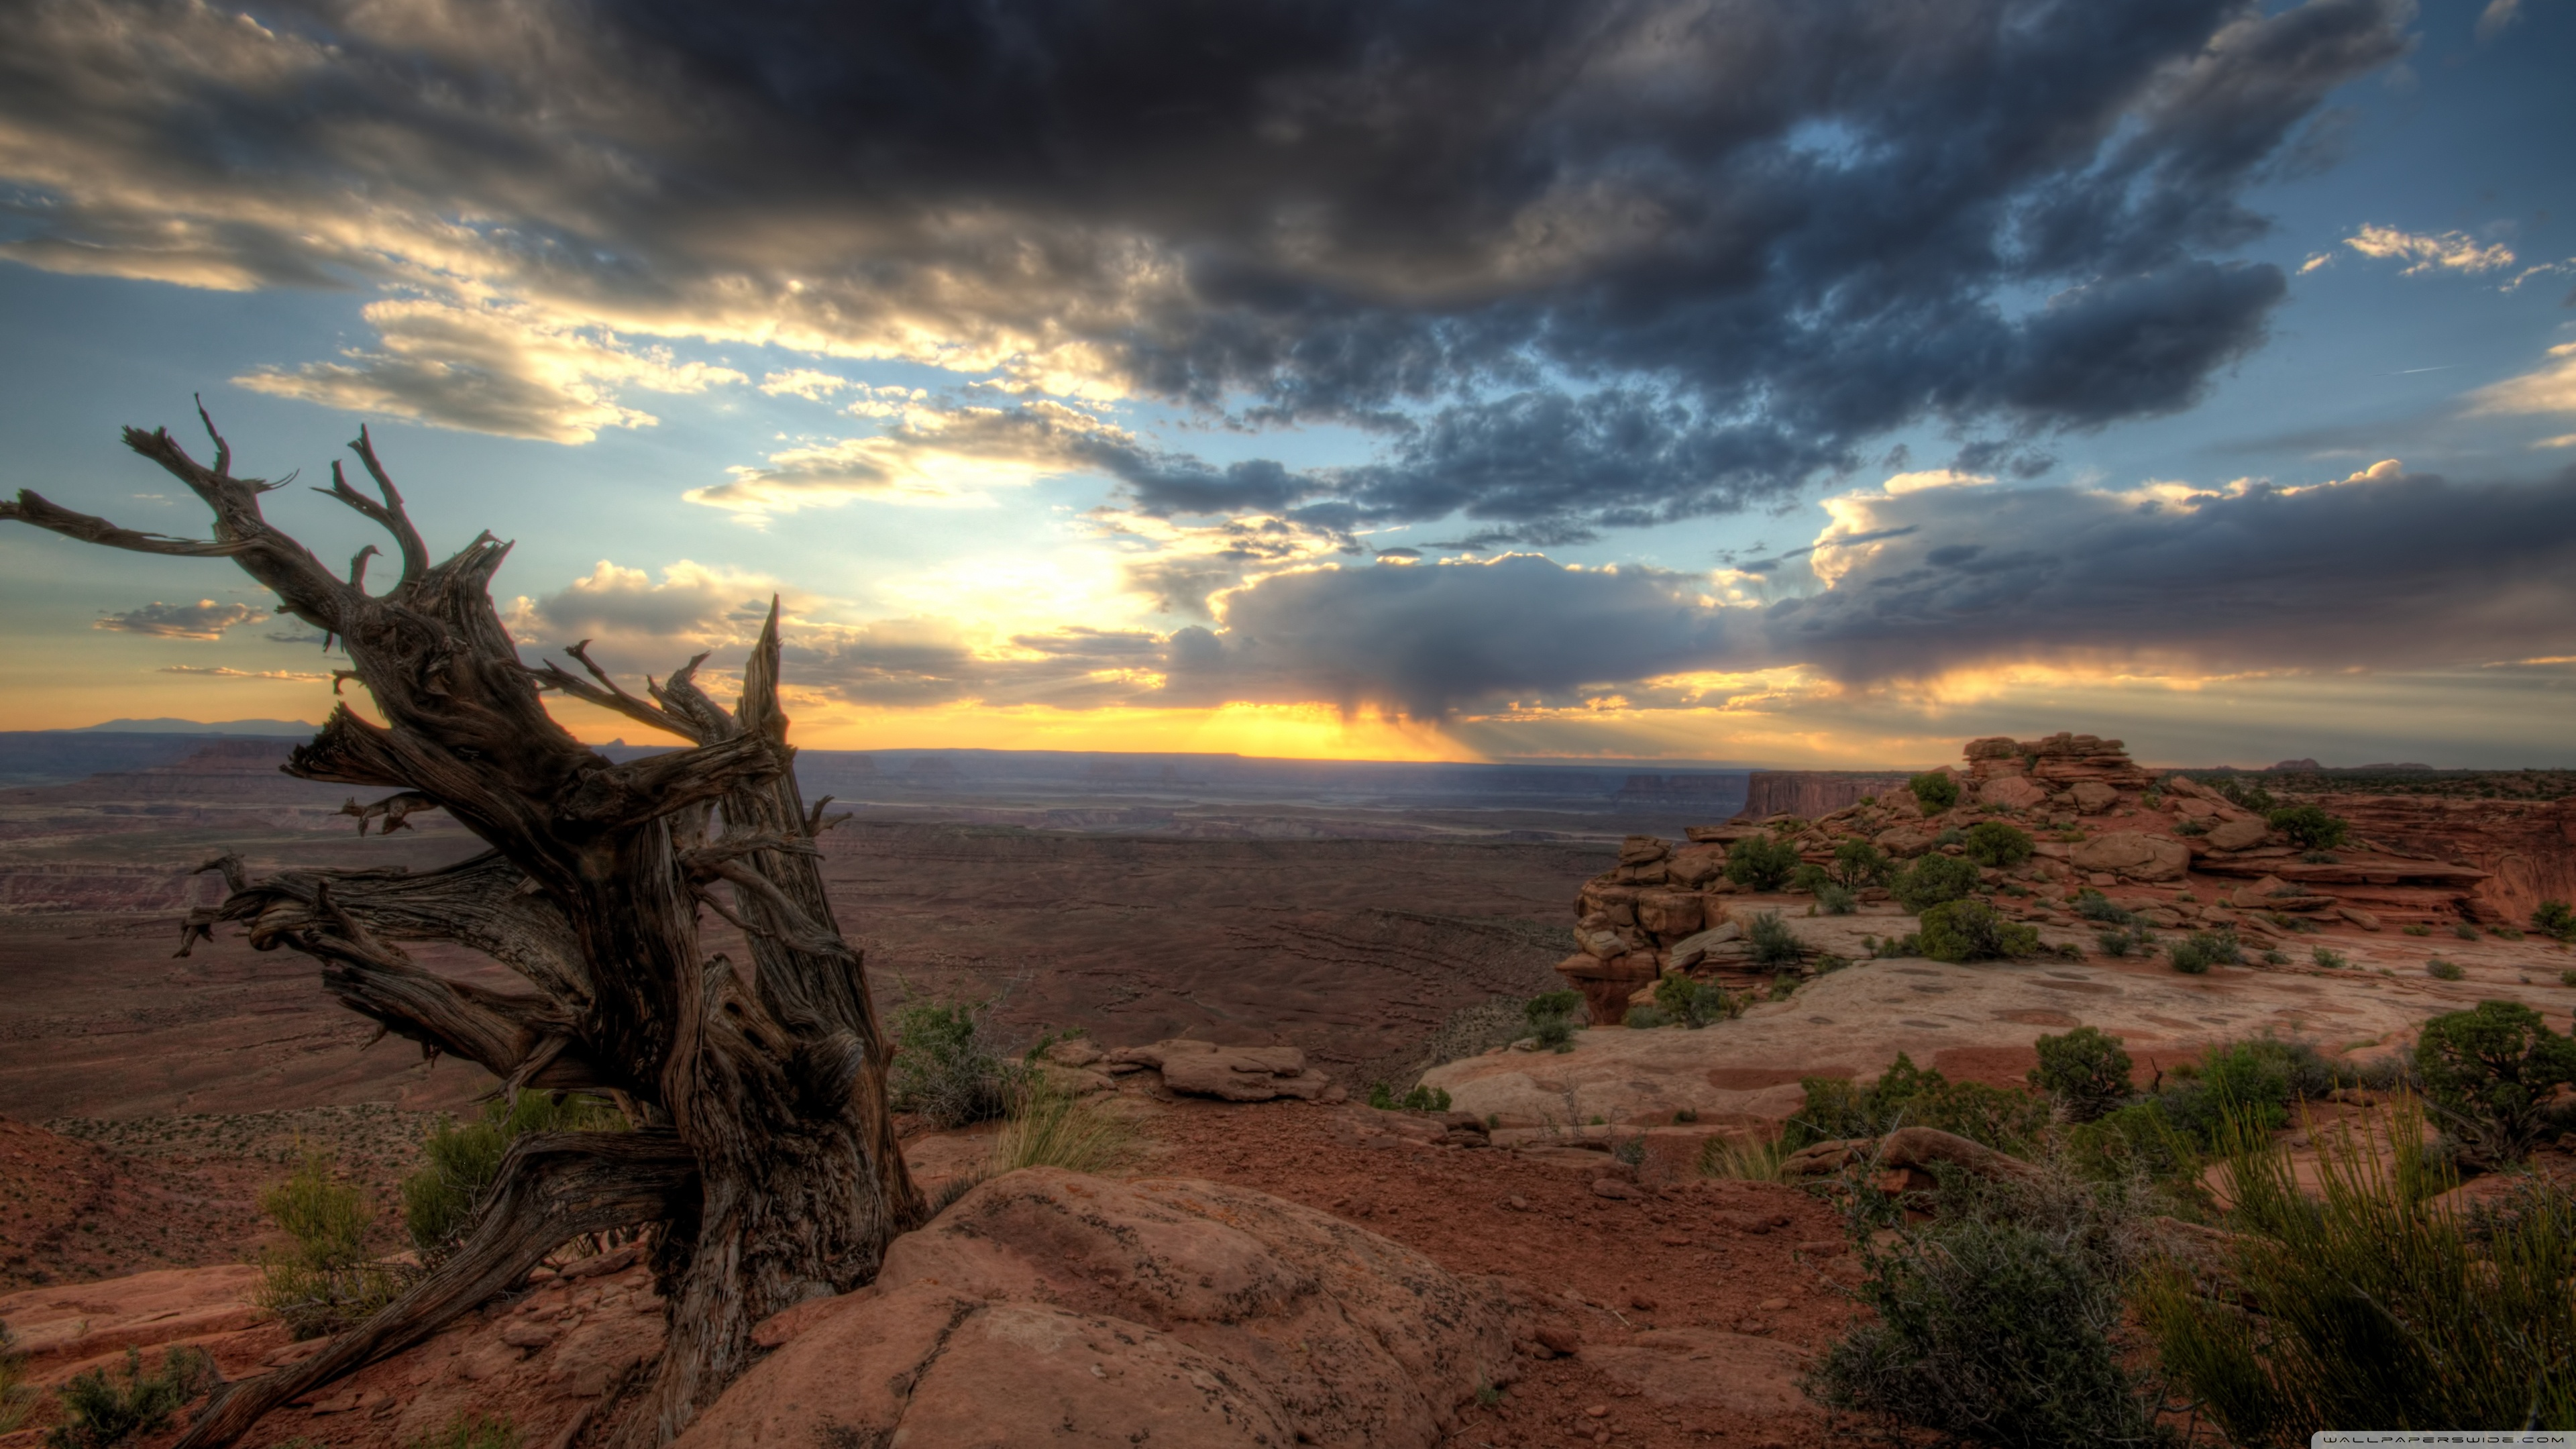 Canyonlands Overlook 4K HD Desktop Wallpaper for 4K Ultra HD TV 3840x2160